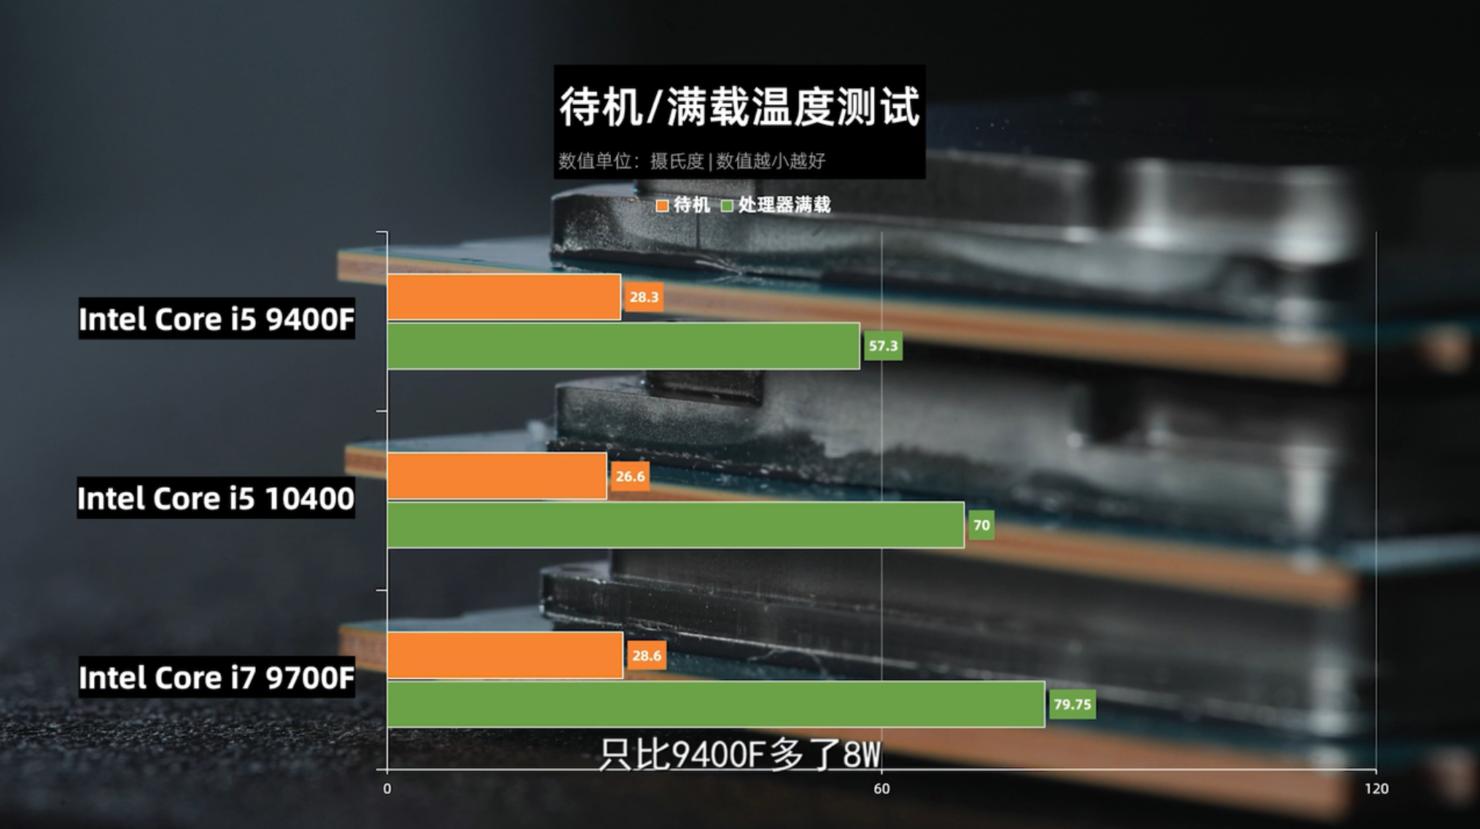 intel-core-i5-10400-comet-lake-s-6-core-desktop-cpu_temperatures